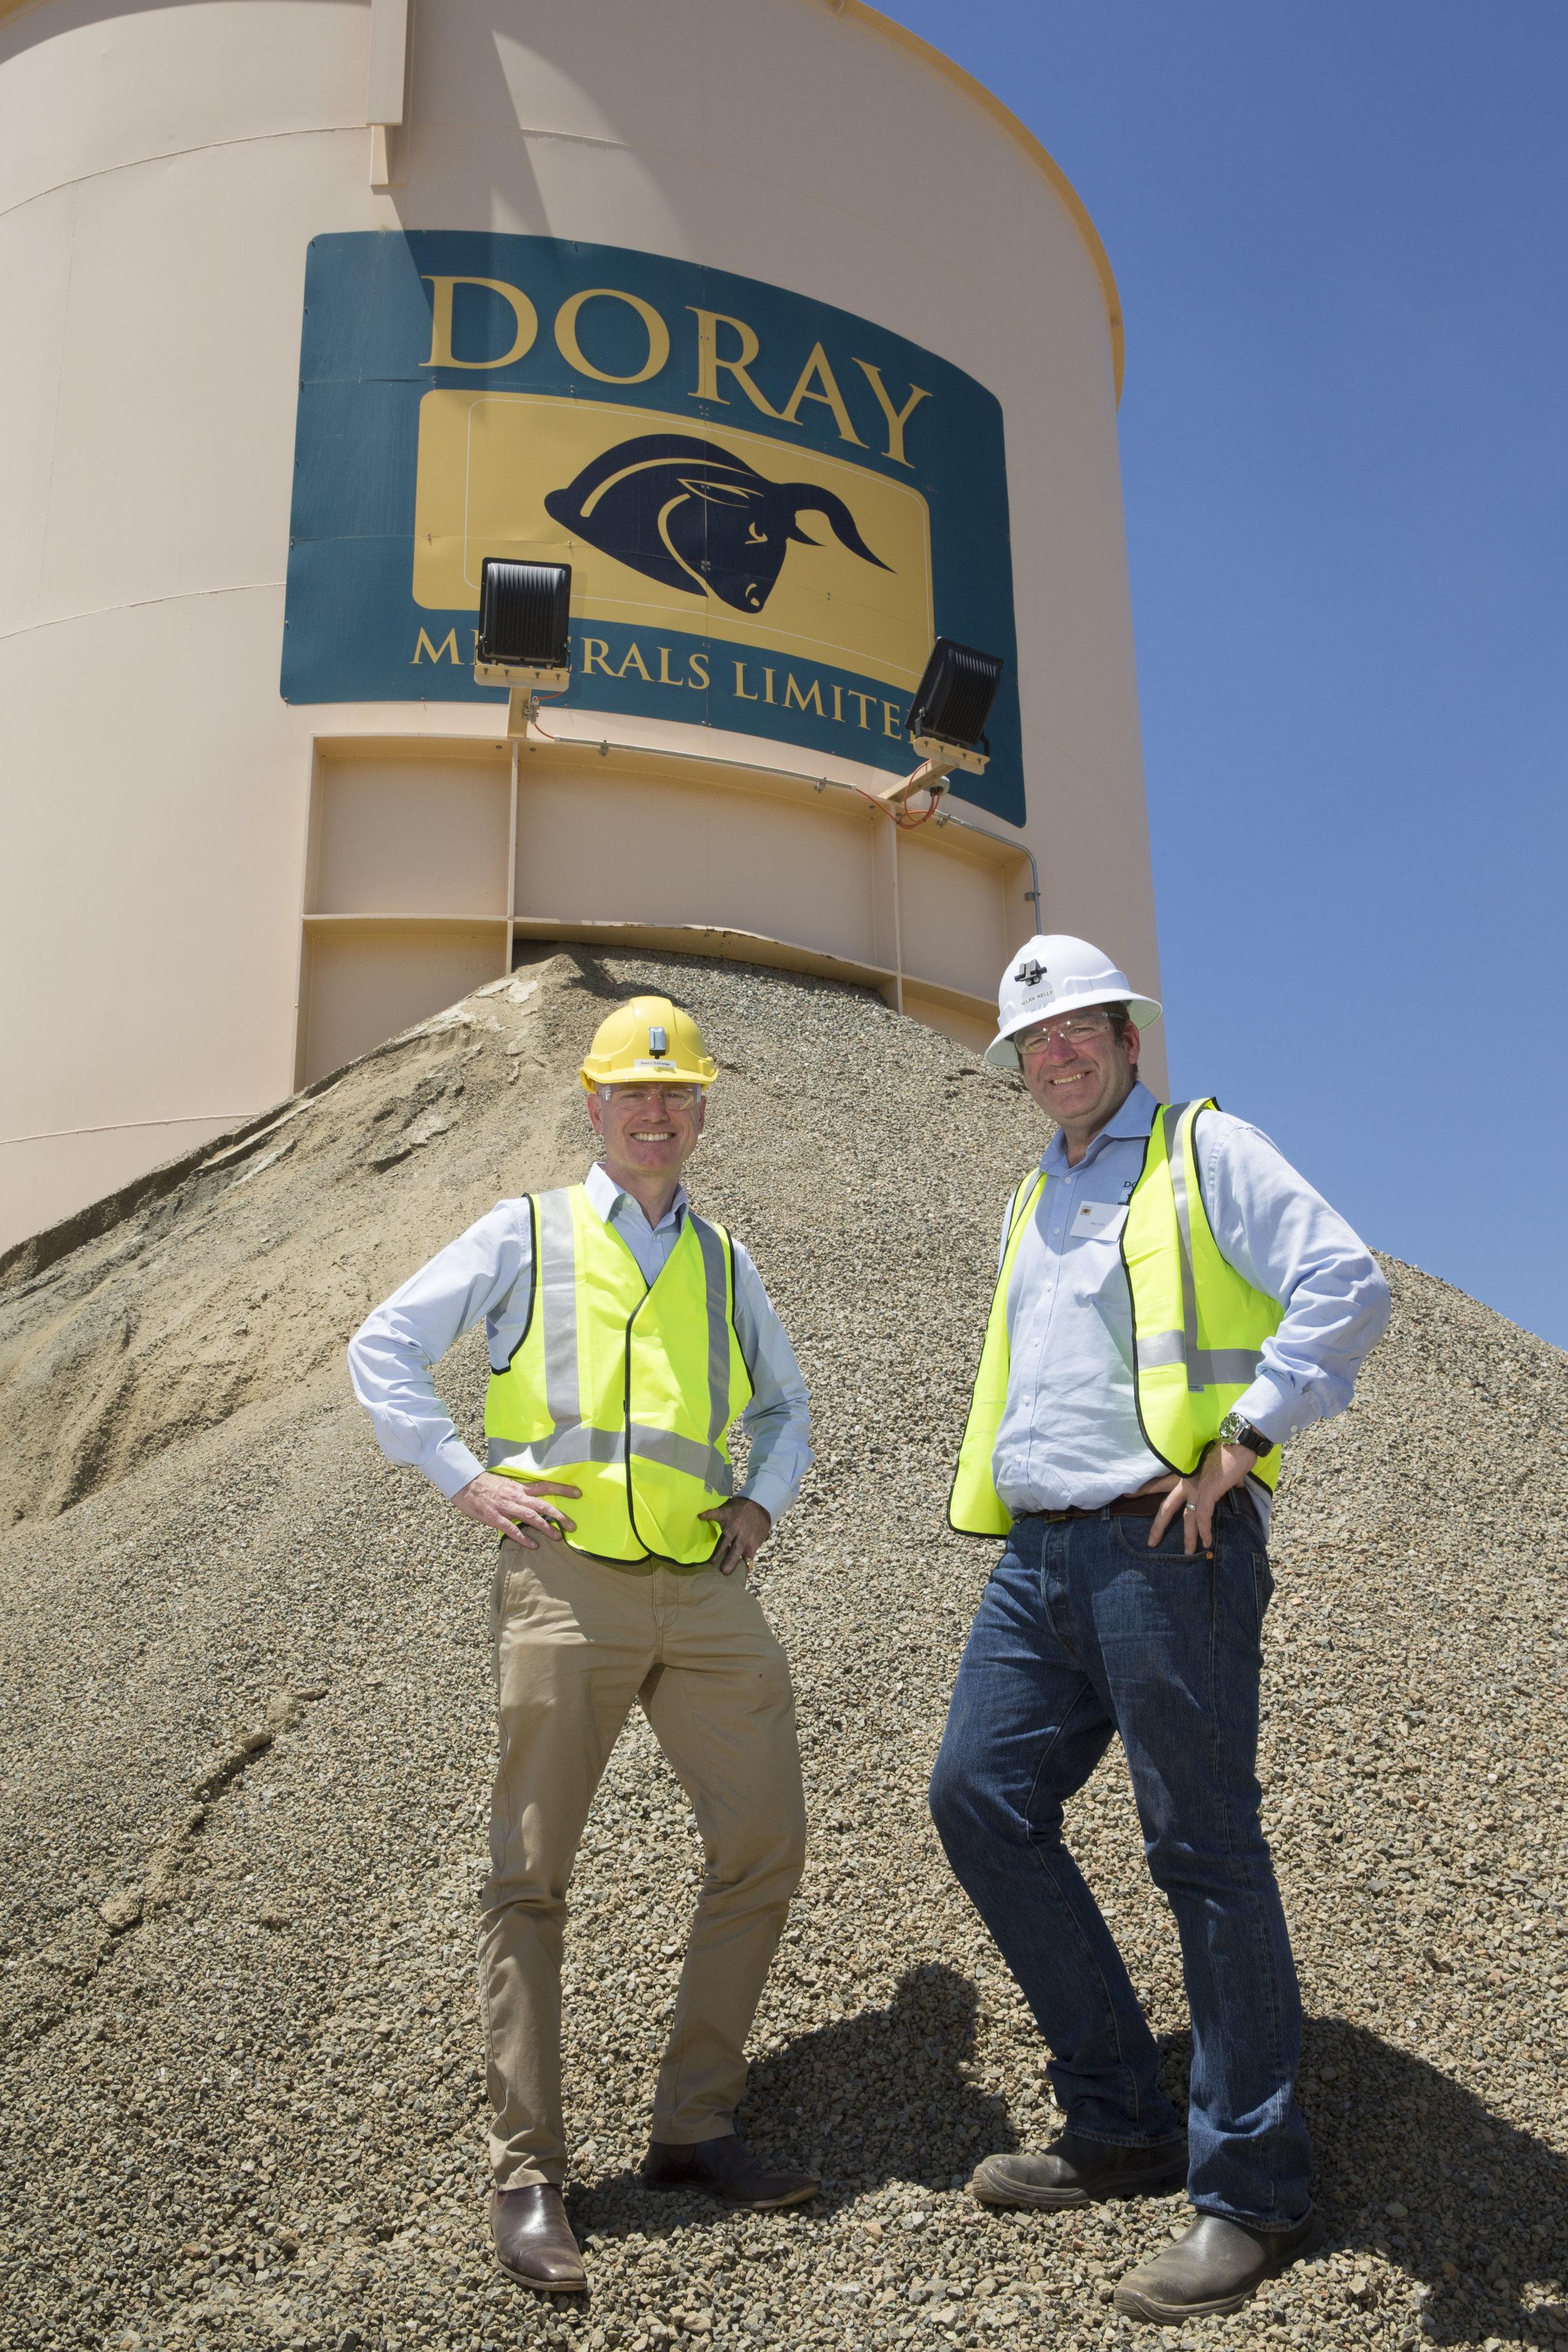 Doray Managing Director, Allan Kelly with Minister for Mines & Petroleum, the Hon Sean L'Estrange MLA.